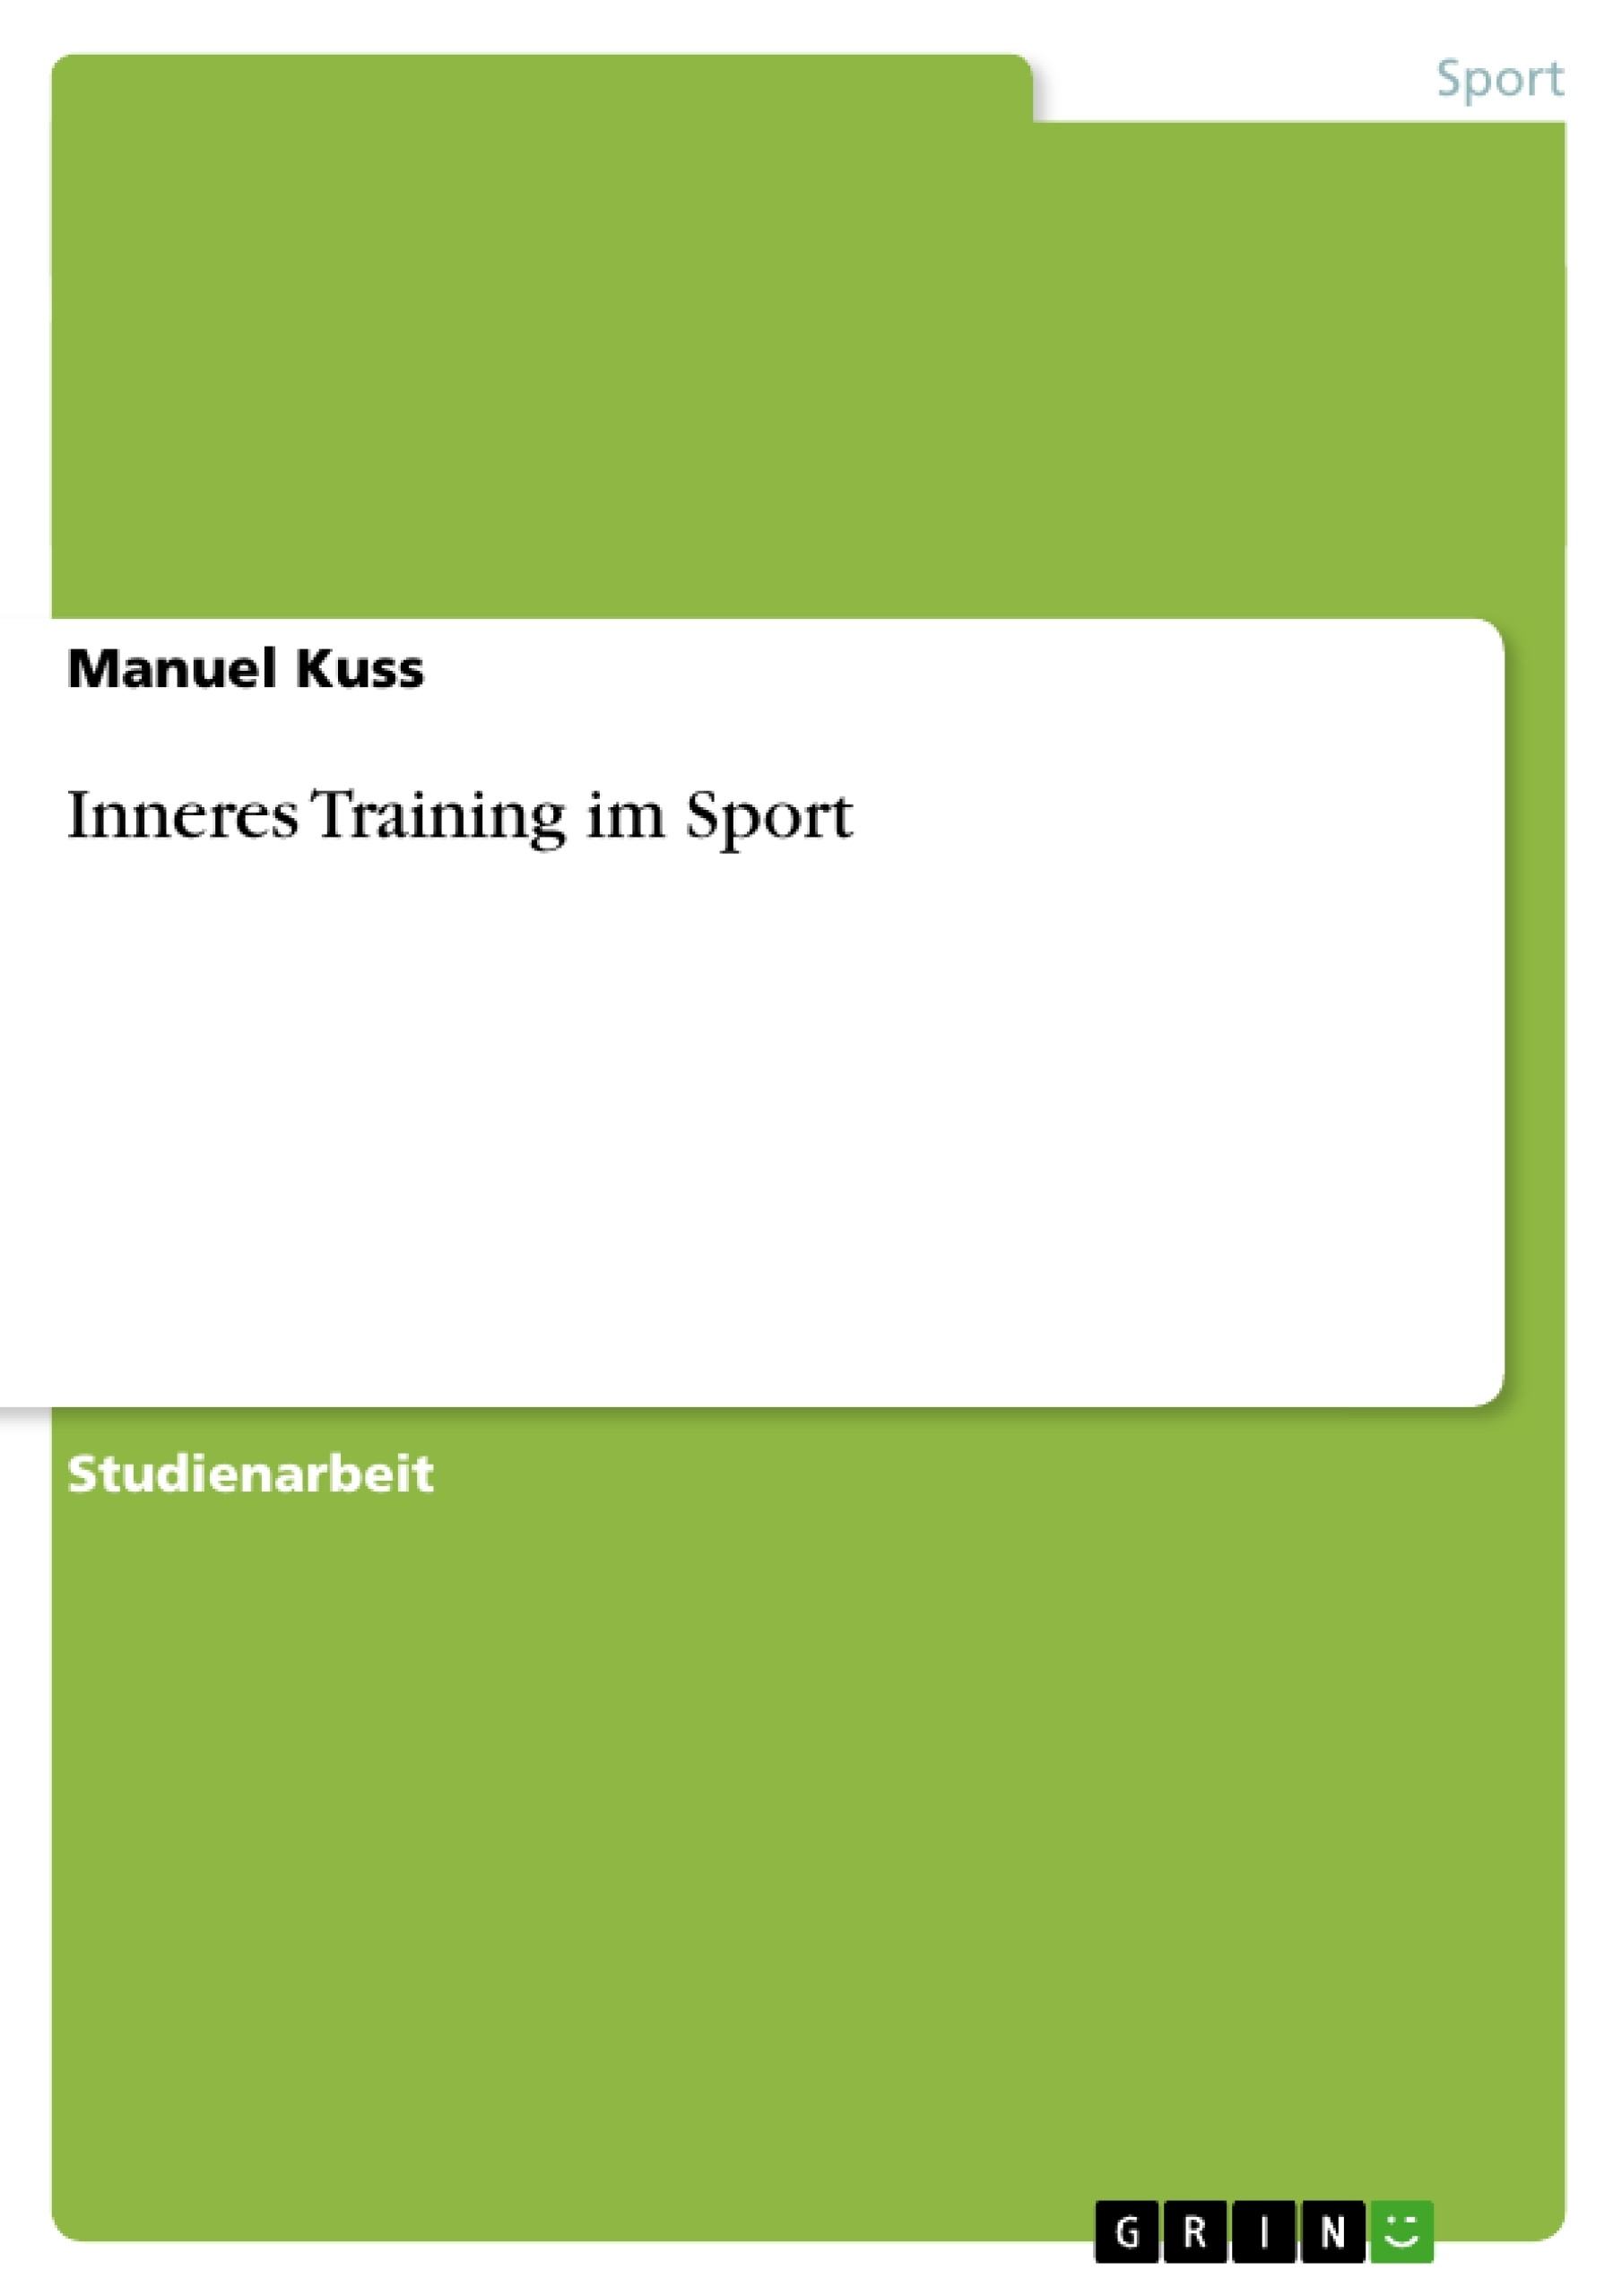 Titel: Inneres Training im Sport